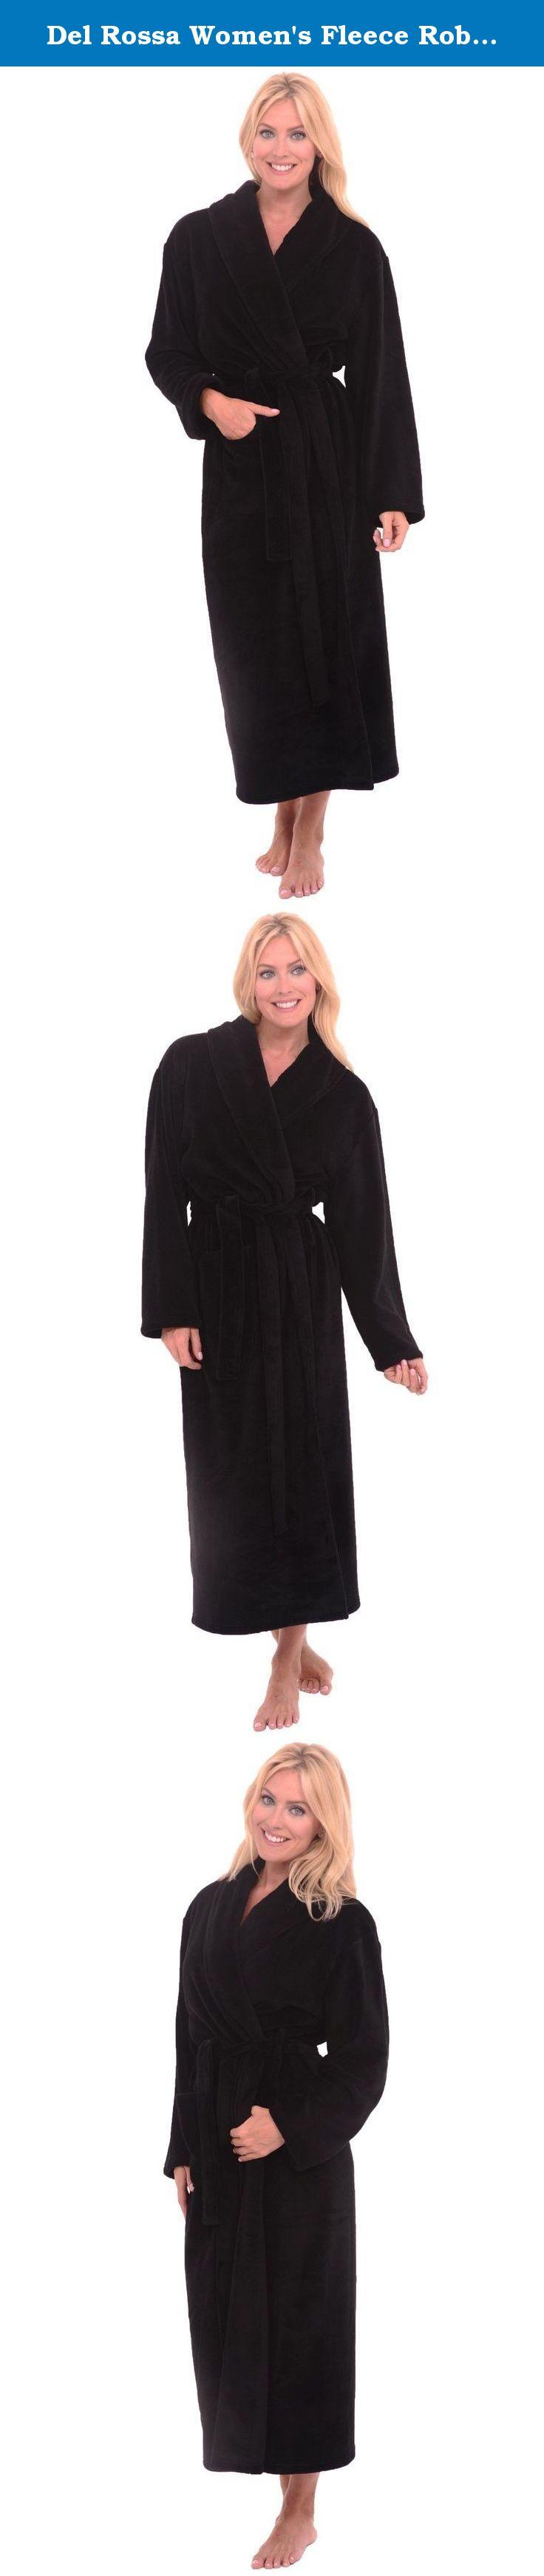 Del rossa womenus fleece robe long bathrobe small medium black